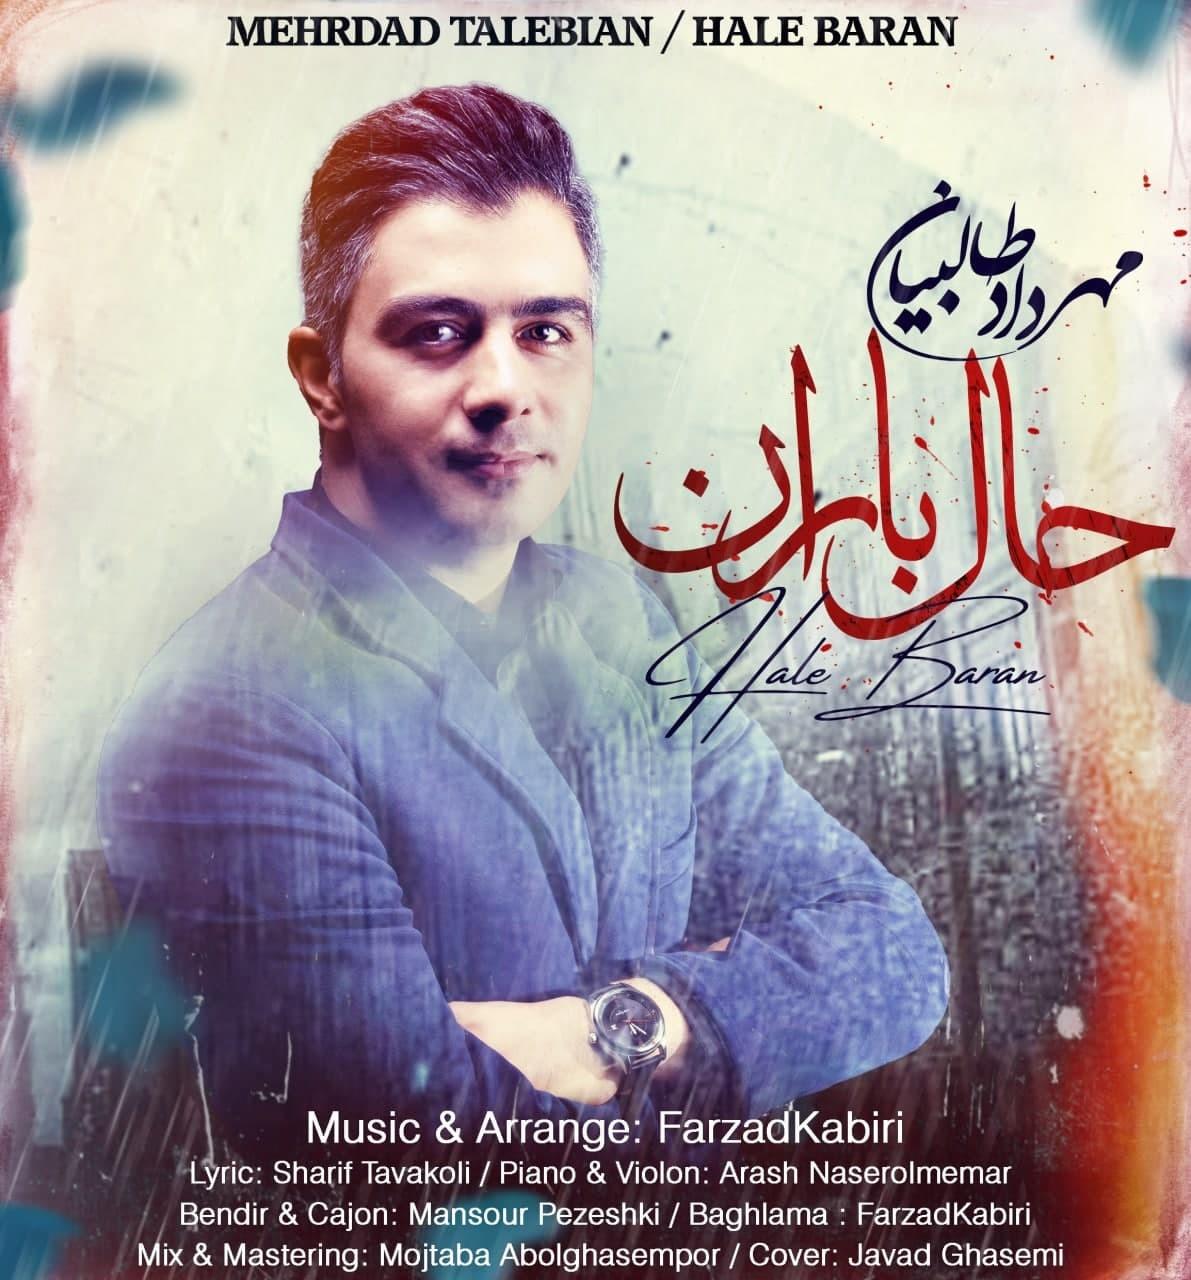 Mehrdad Talebian - Hale Baran